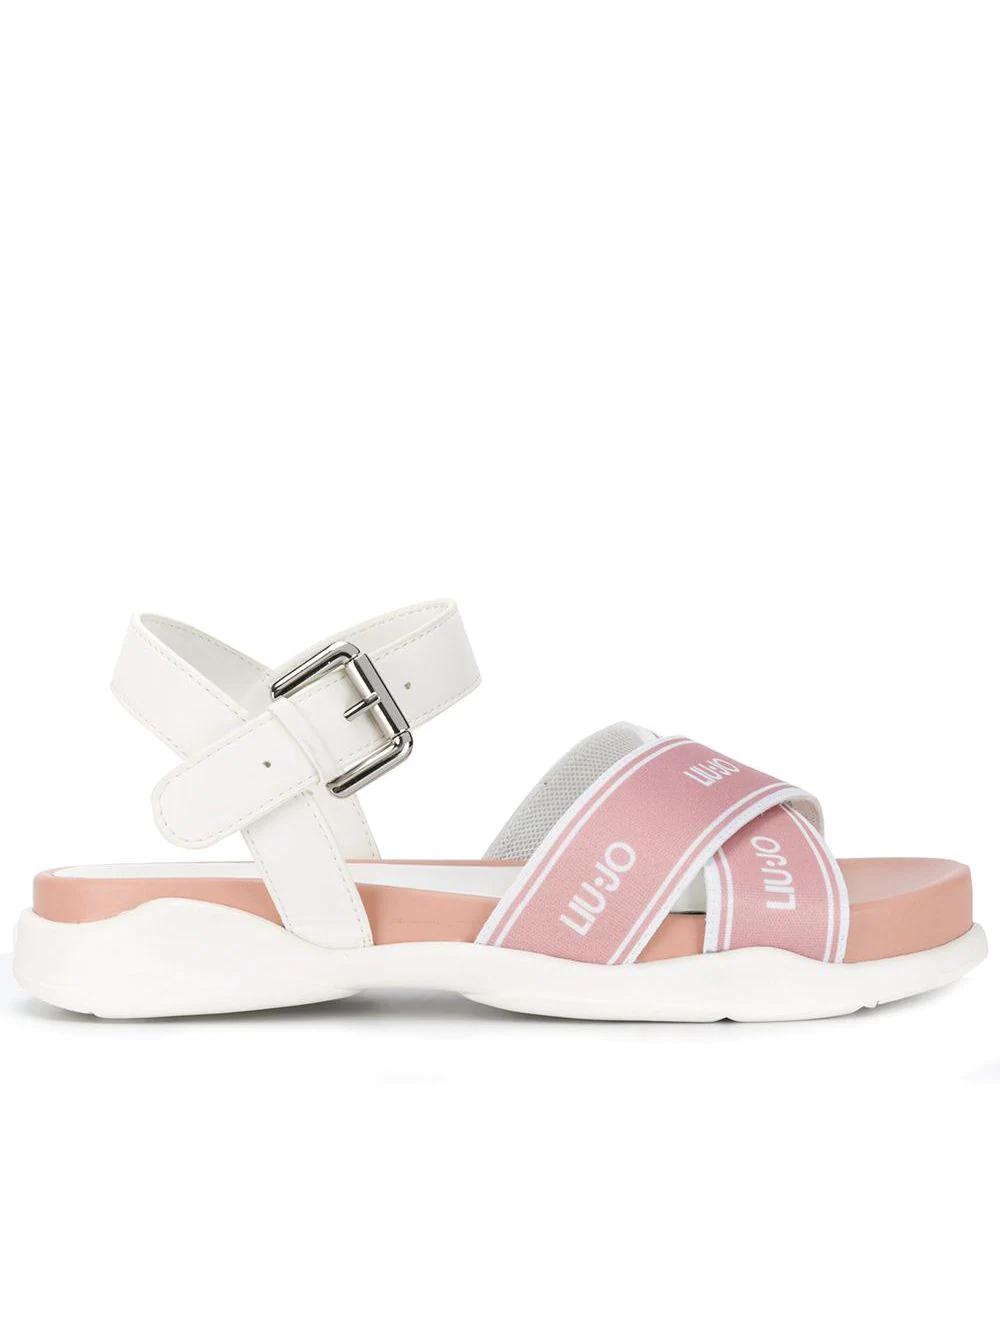 Liu•Jo | сандалии с перекрестными ремешками | Clouty